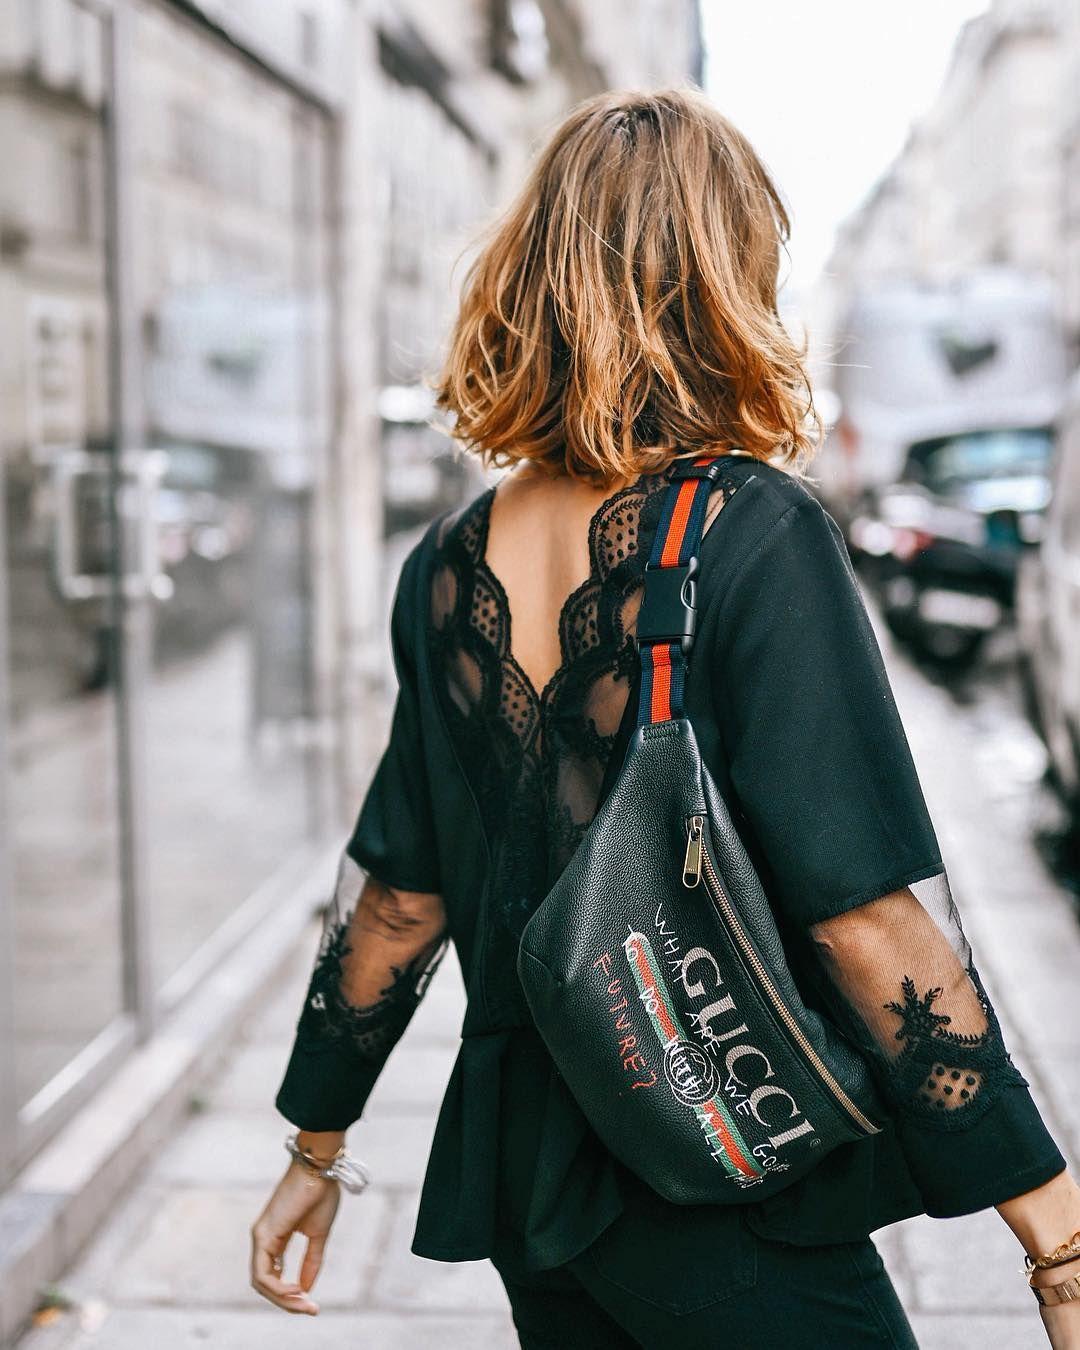 Banane gucci   lace top   style   Gucci handbags, Gucci, Style 31ae9404359